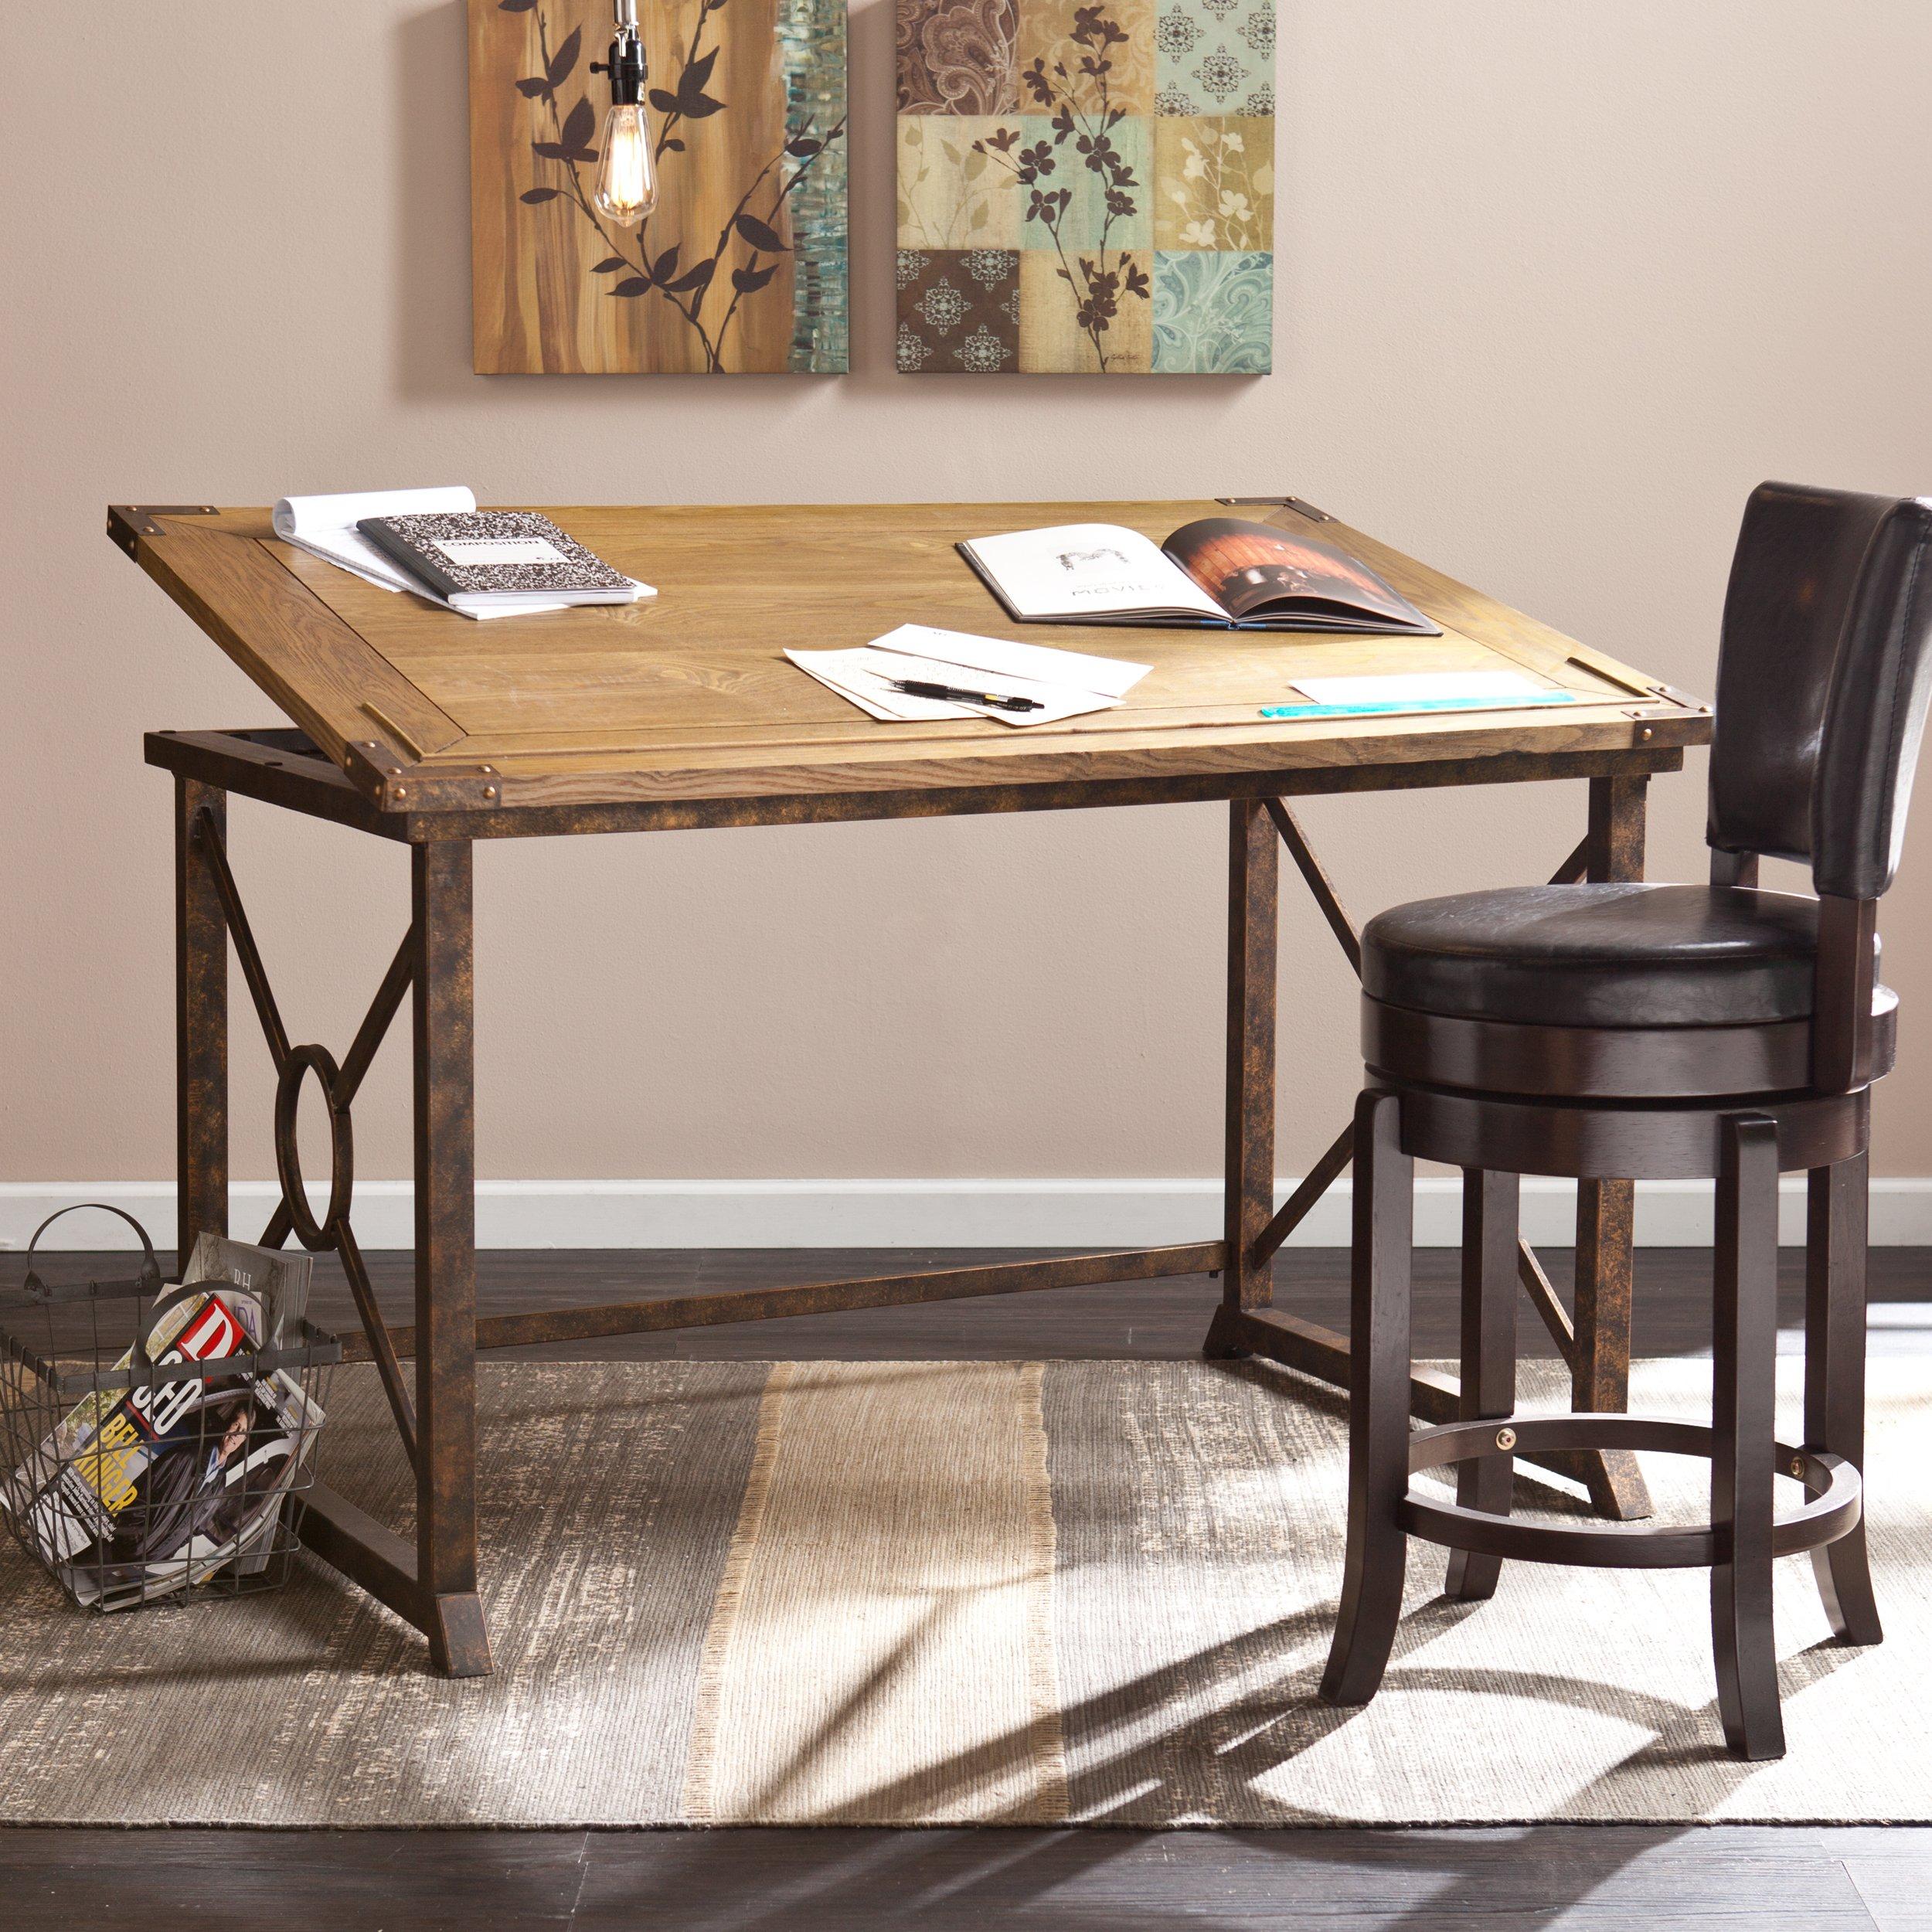 Southern Enterprises Knightley Tilt Top Drafting Table - 51.5'' Wide - Oak Wood Finish w/Antique Brass by Southern Enterprises